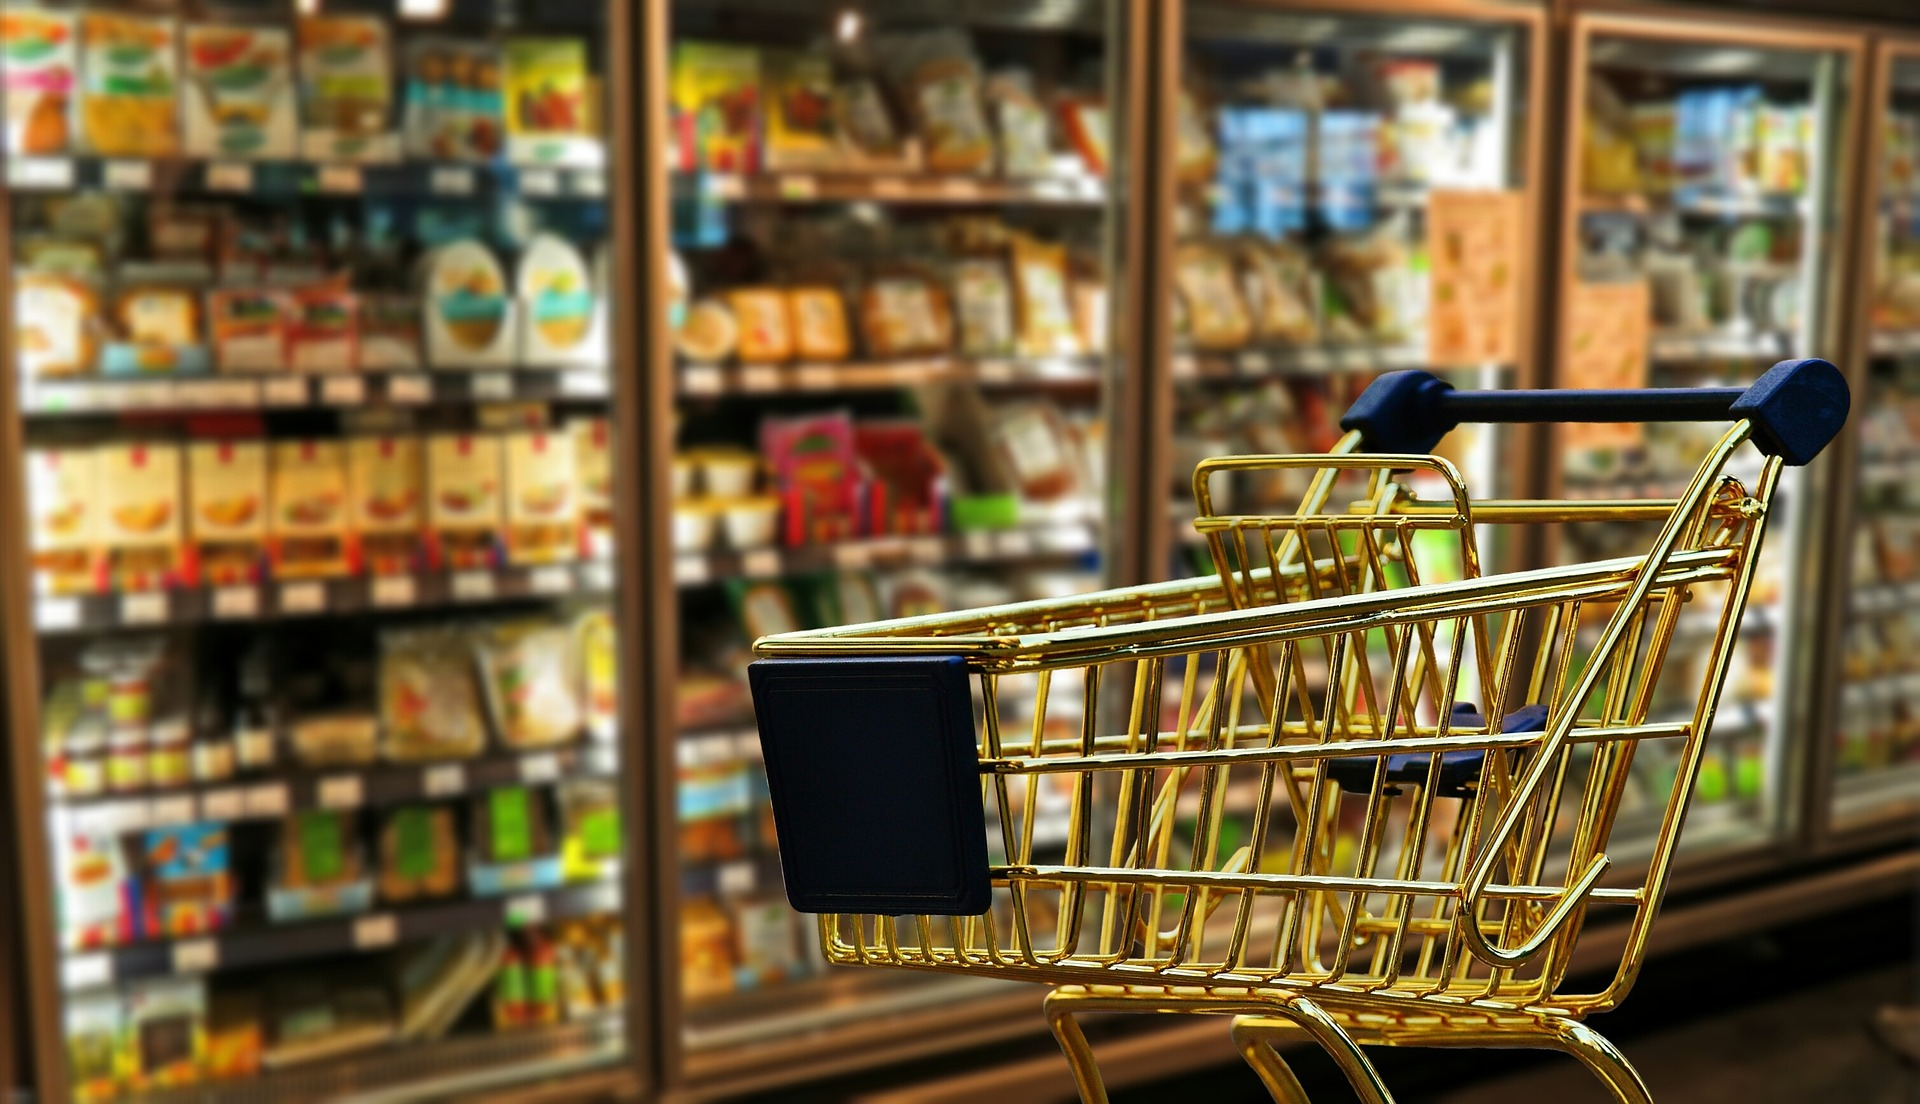 nakupny vozik supermarket regal produkty